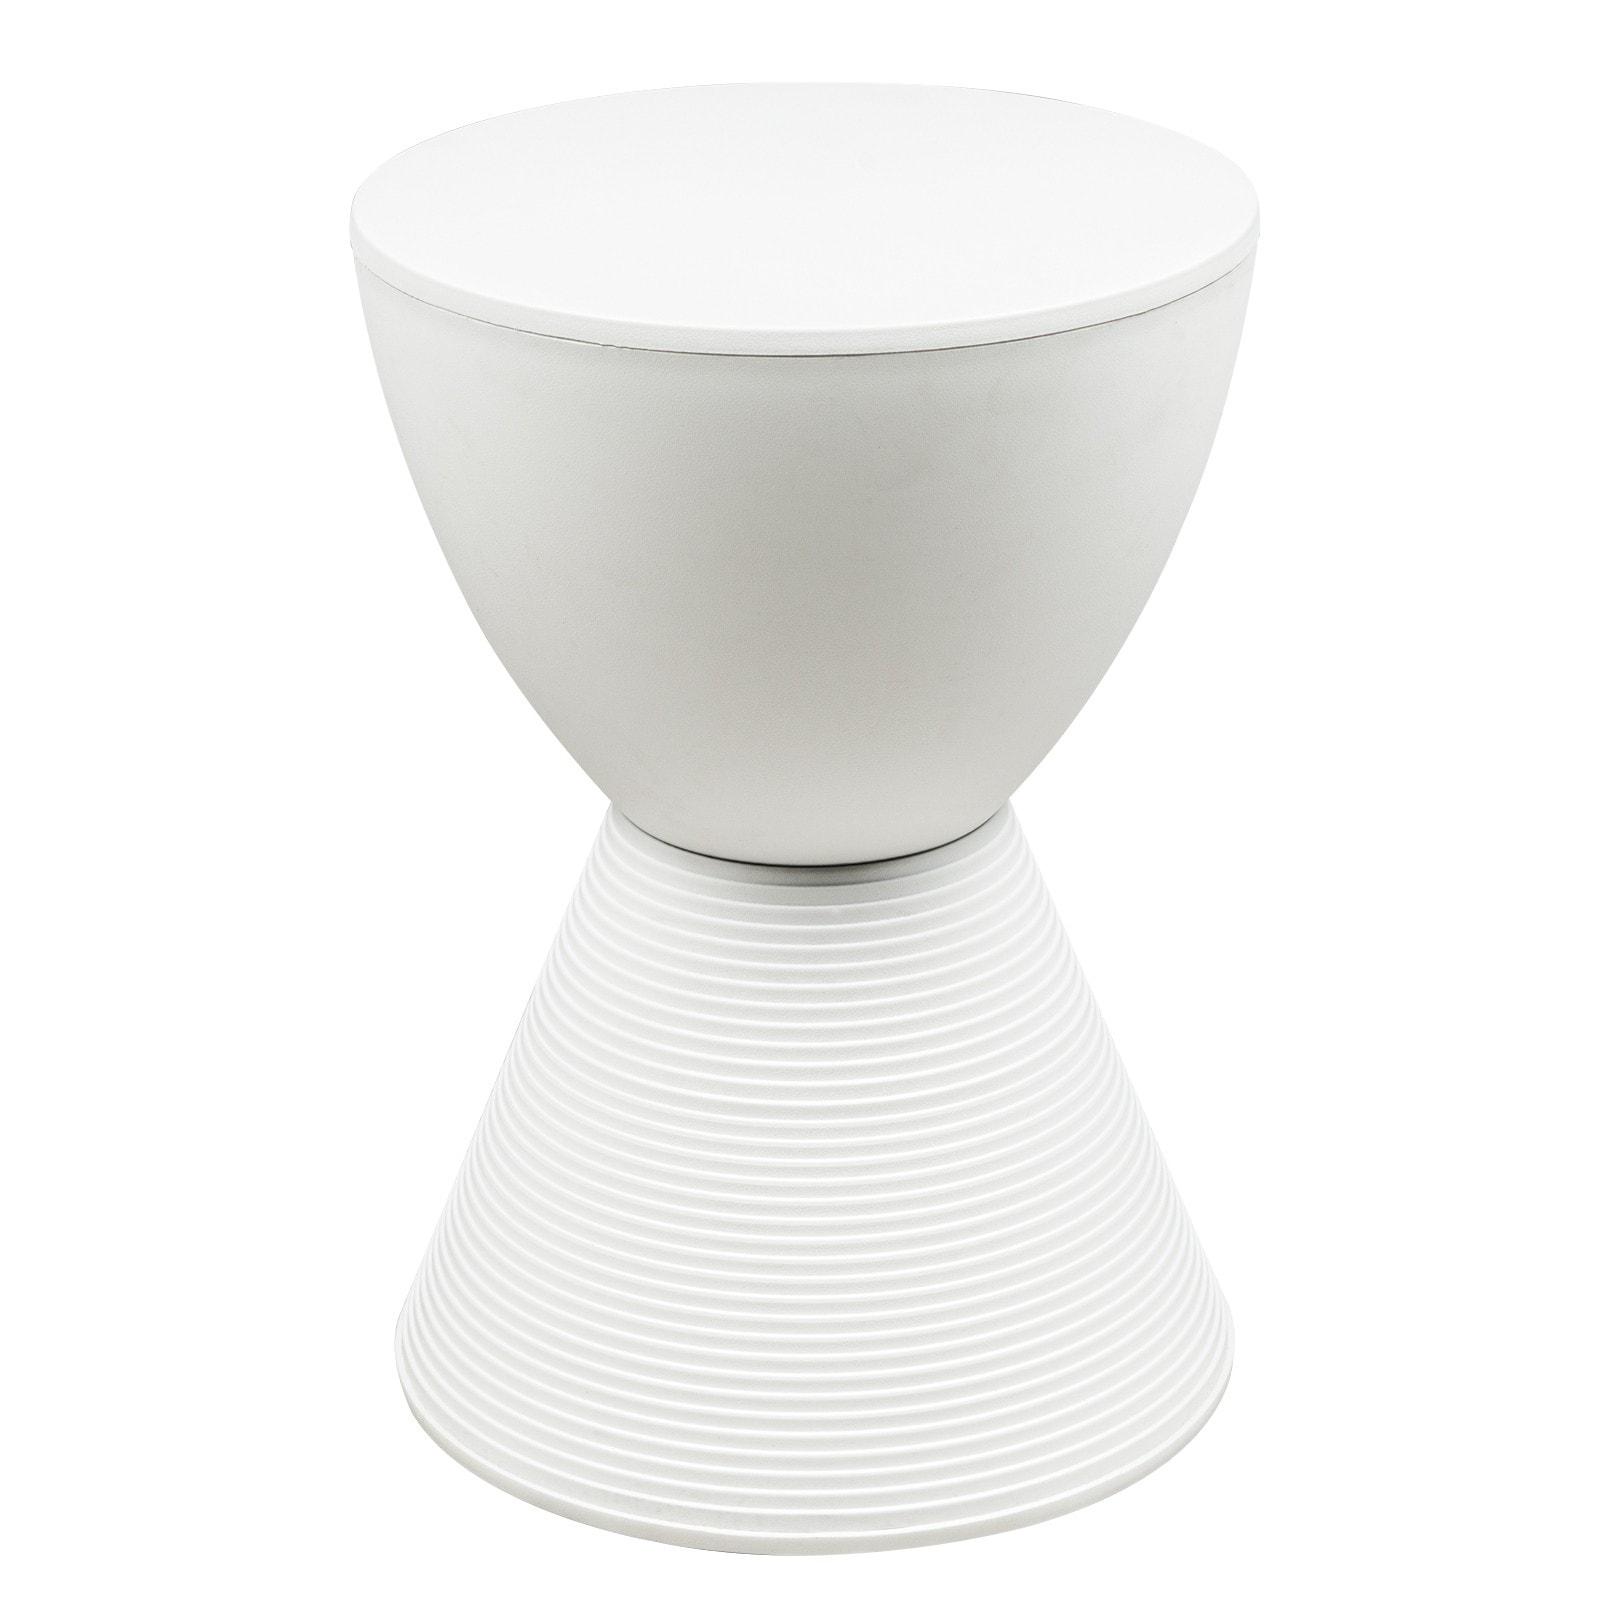 LeisureMod Modern Boyd Round White Side Table (Boyd Modern ABS Plastic Stool in White)